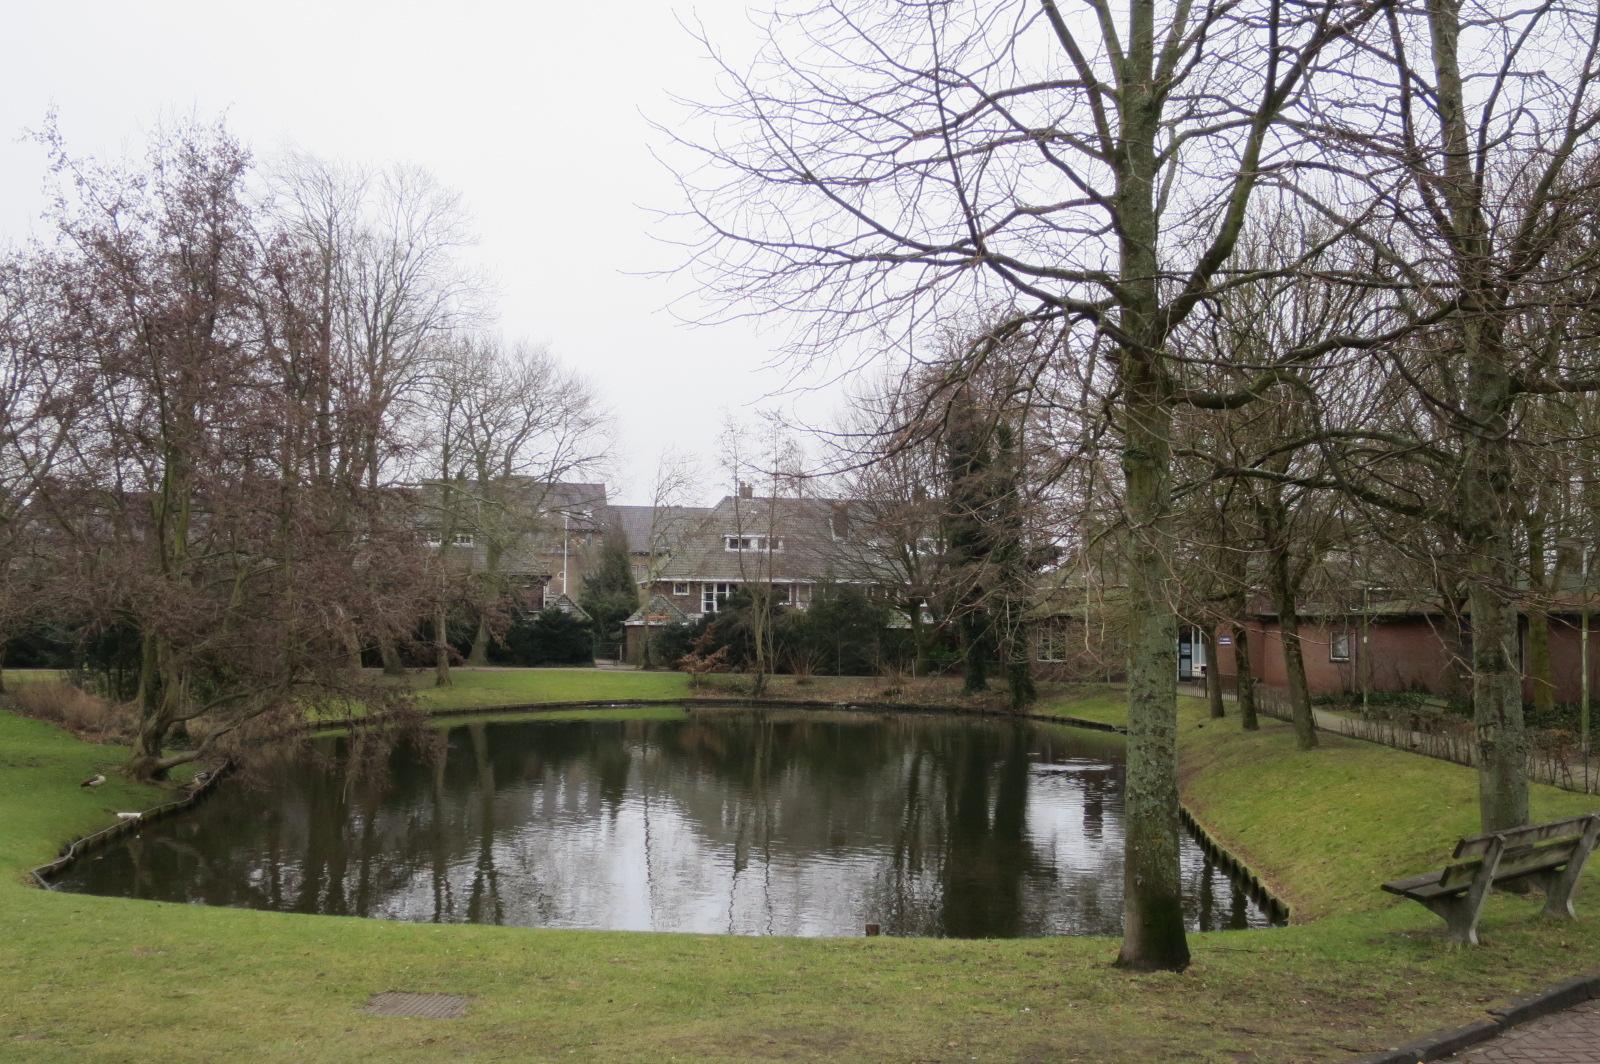 Bispinckpark, Bloemendaal